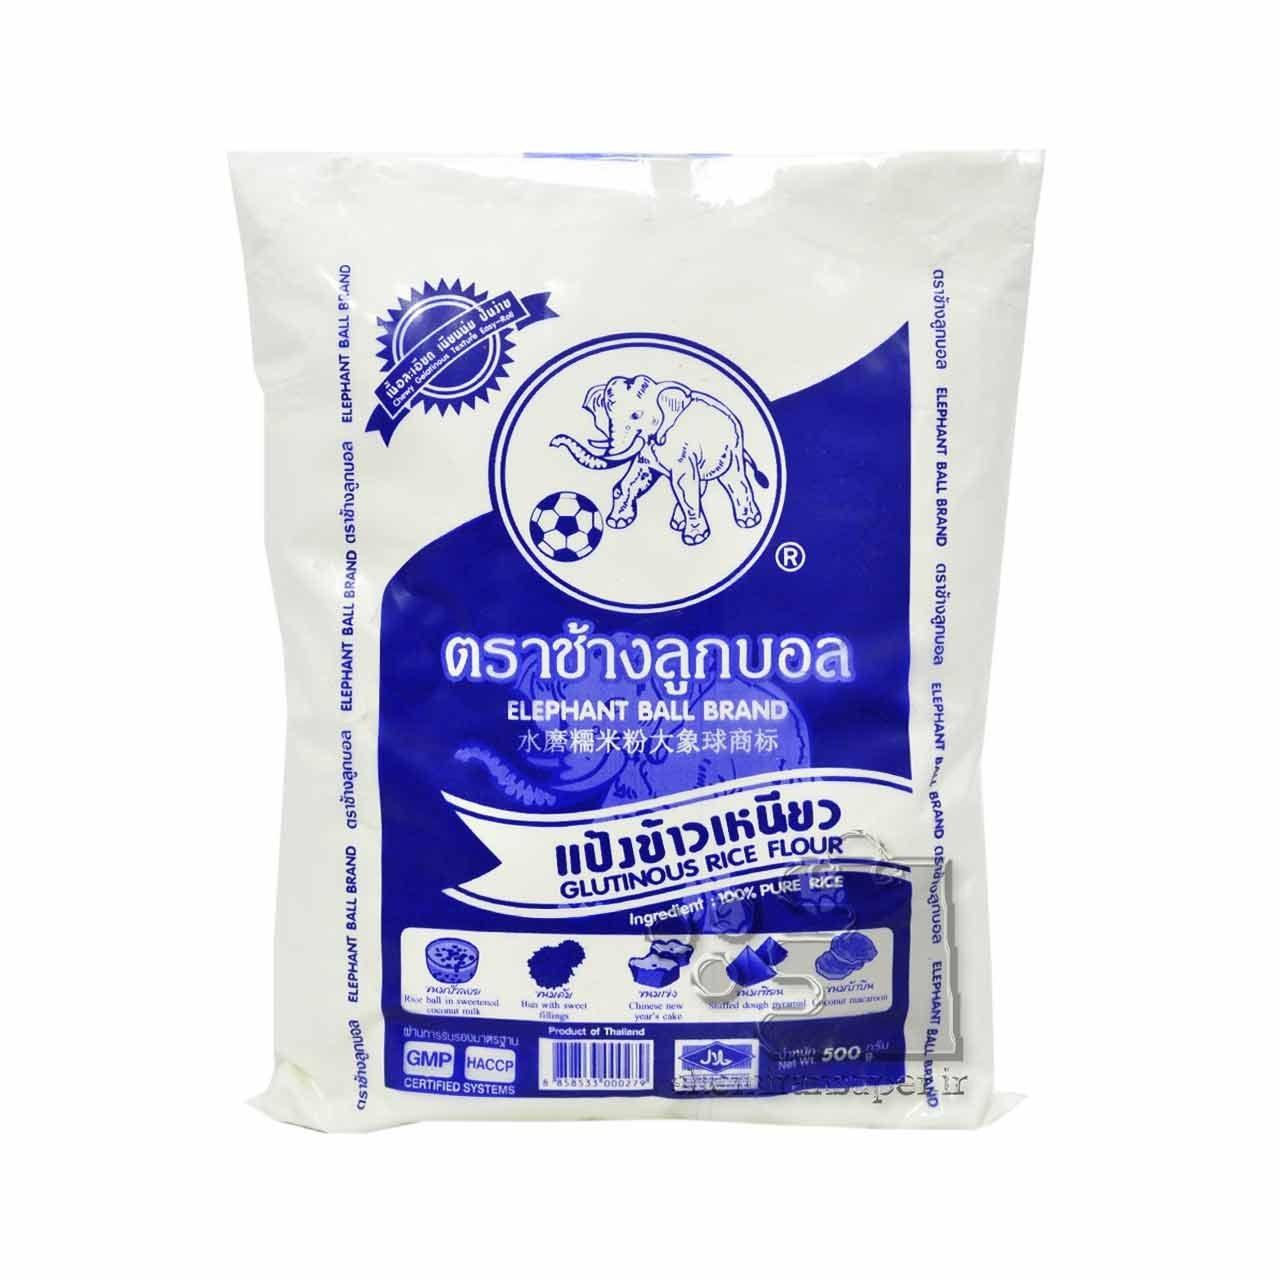 تصویر آرد برنج گلوتینوس ( گلوتینوس رایس موچی / دوکبوکی ) ۵۰۰ گرم – elephant